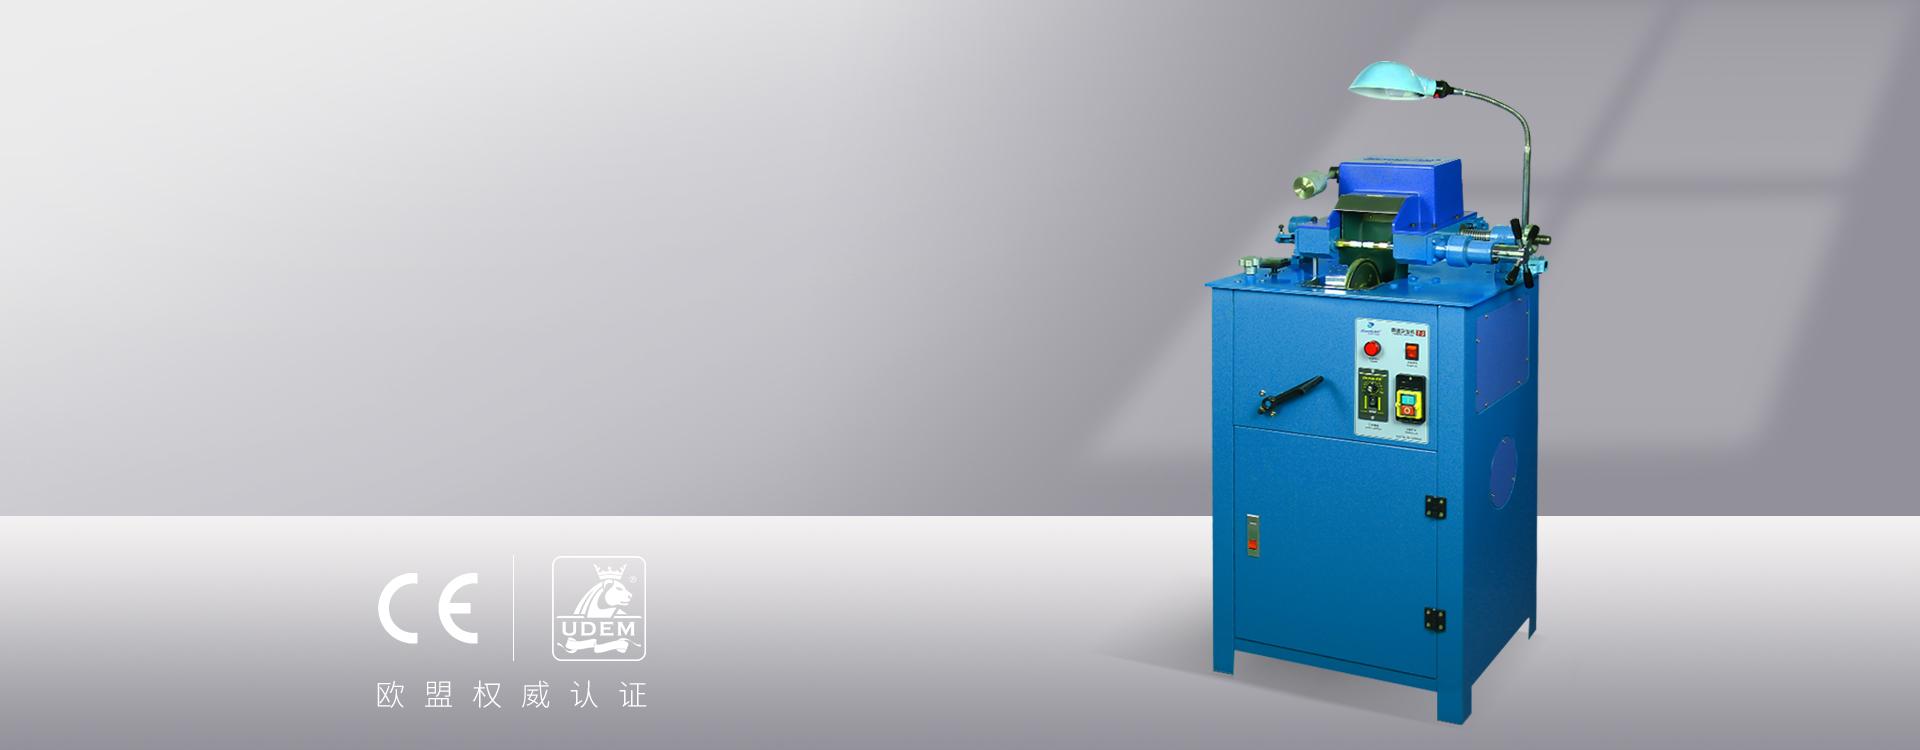 Gemstone  Forming machine T3